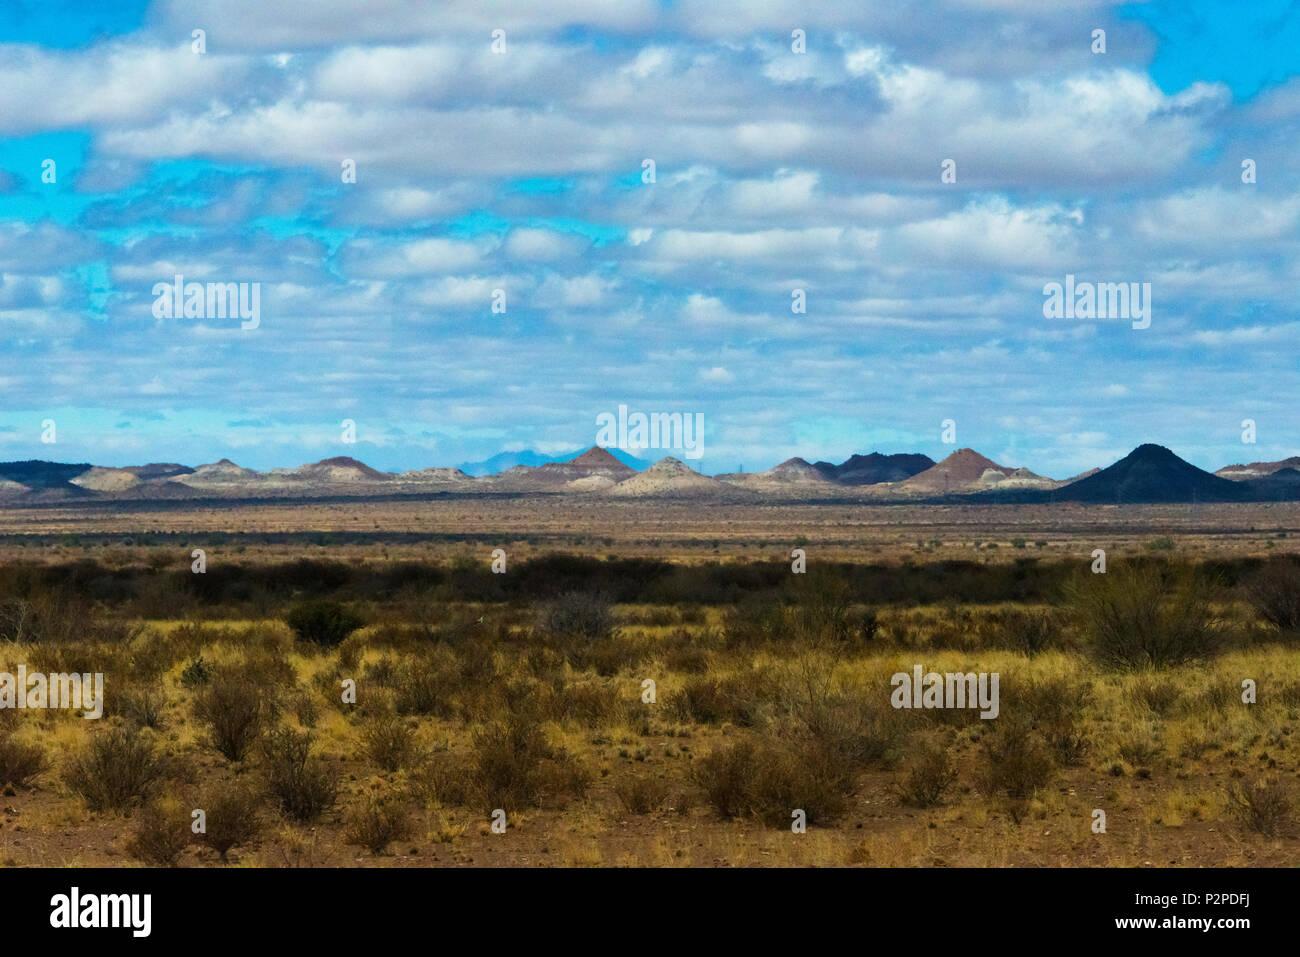 Landscape of Kalahari Desert, Karas Region, Namibia - Stock Image